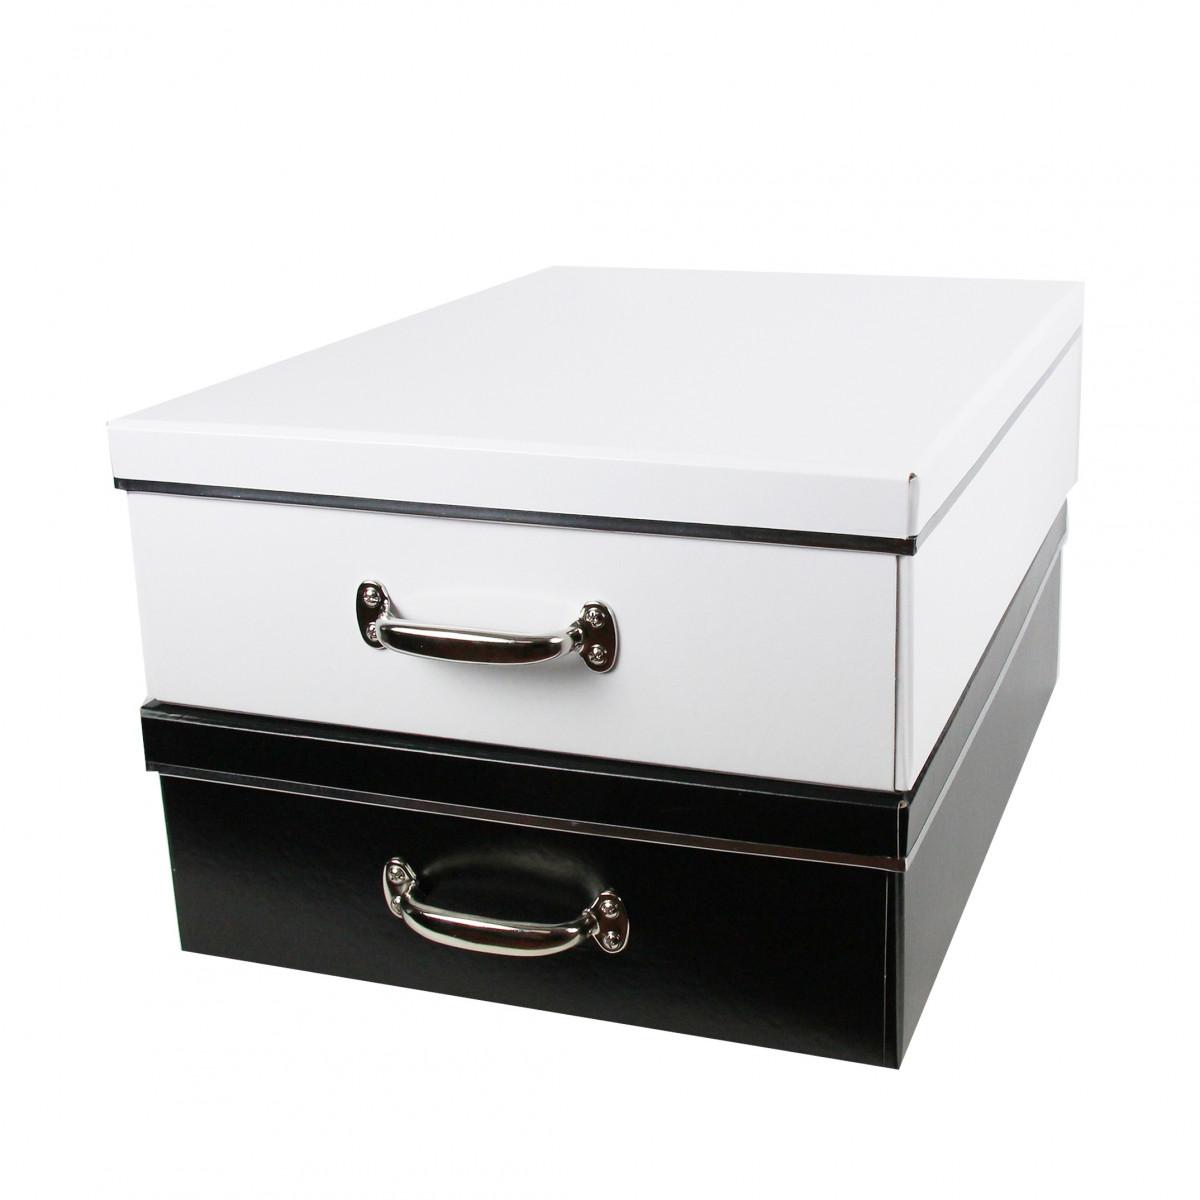 Bo te en carton noir rangement sous le lit - Boite de rangement sous le lit ...